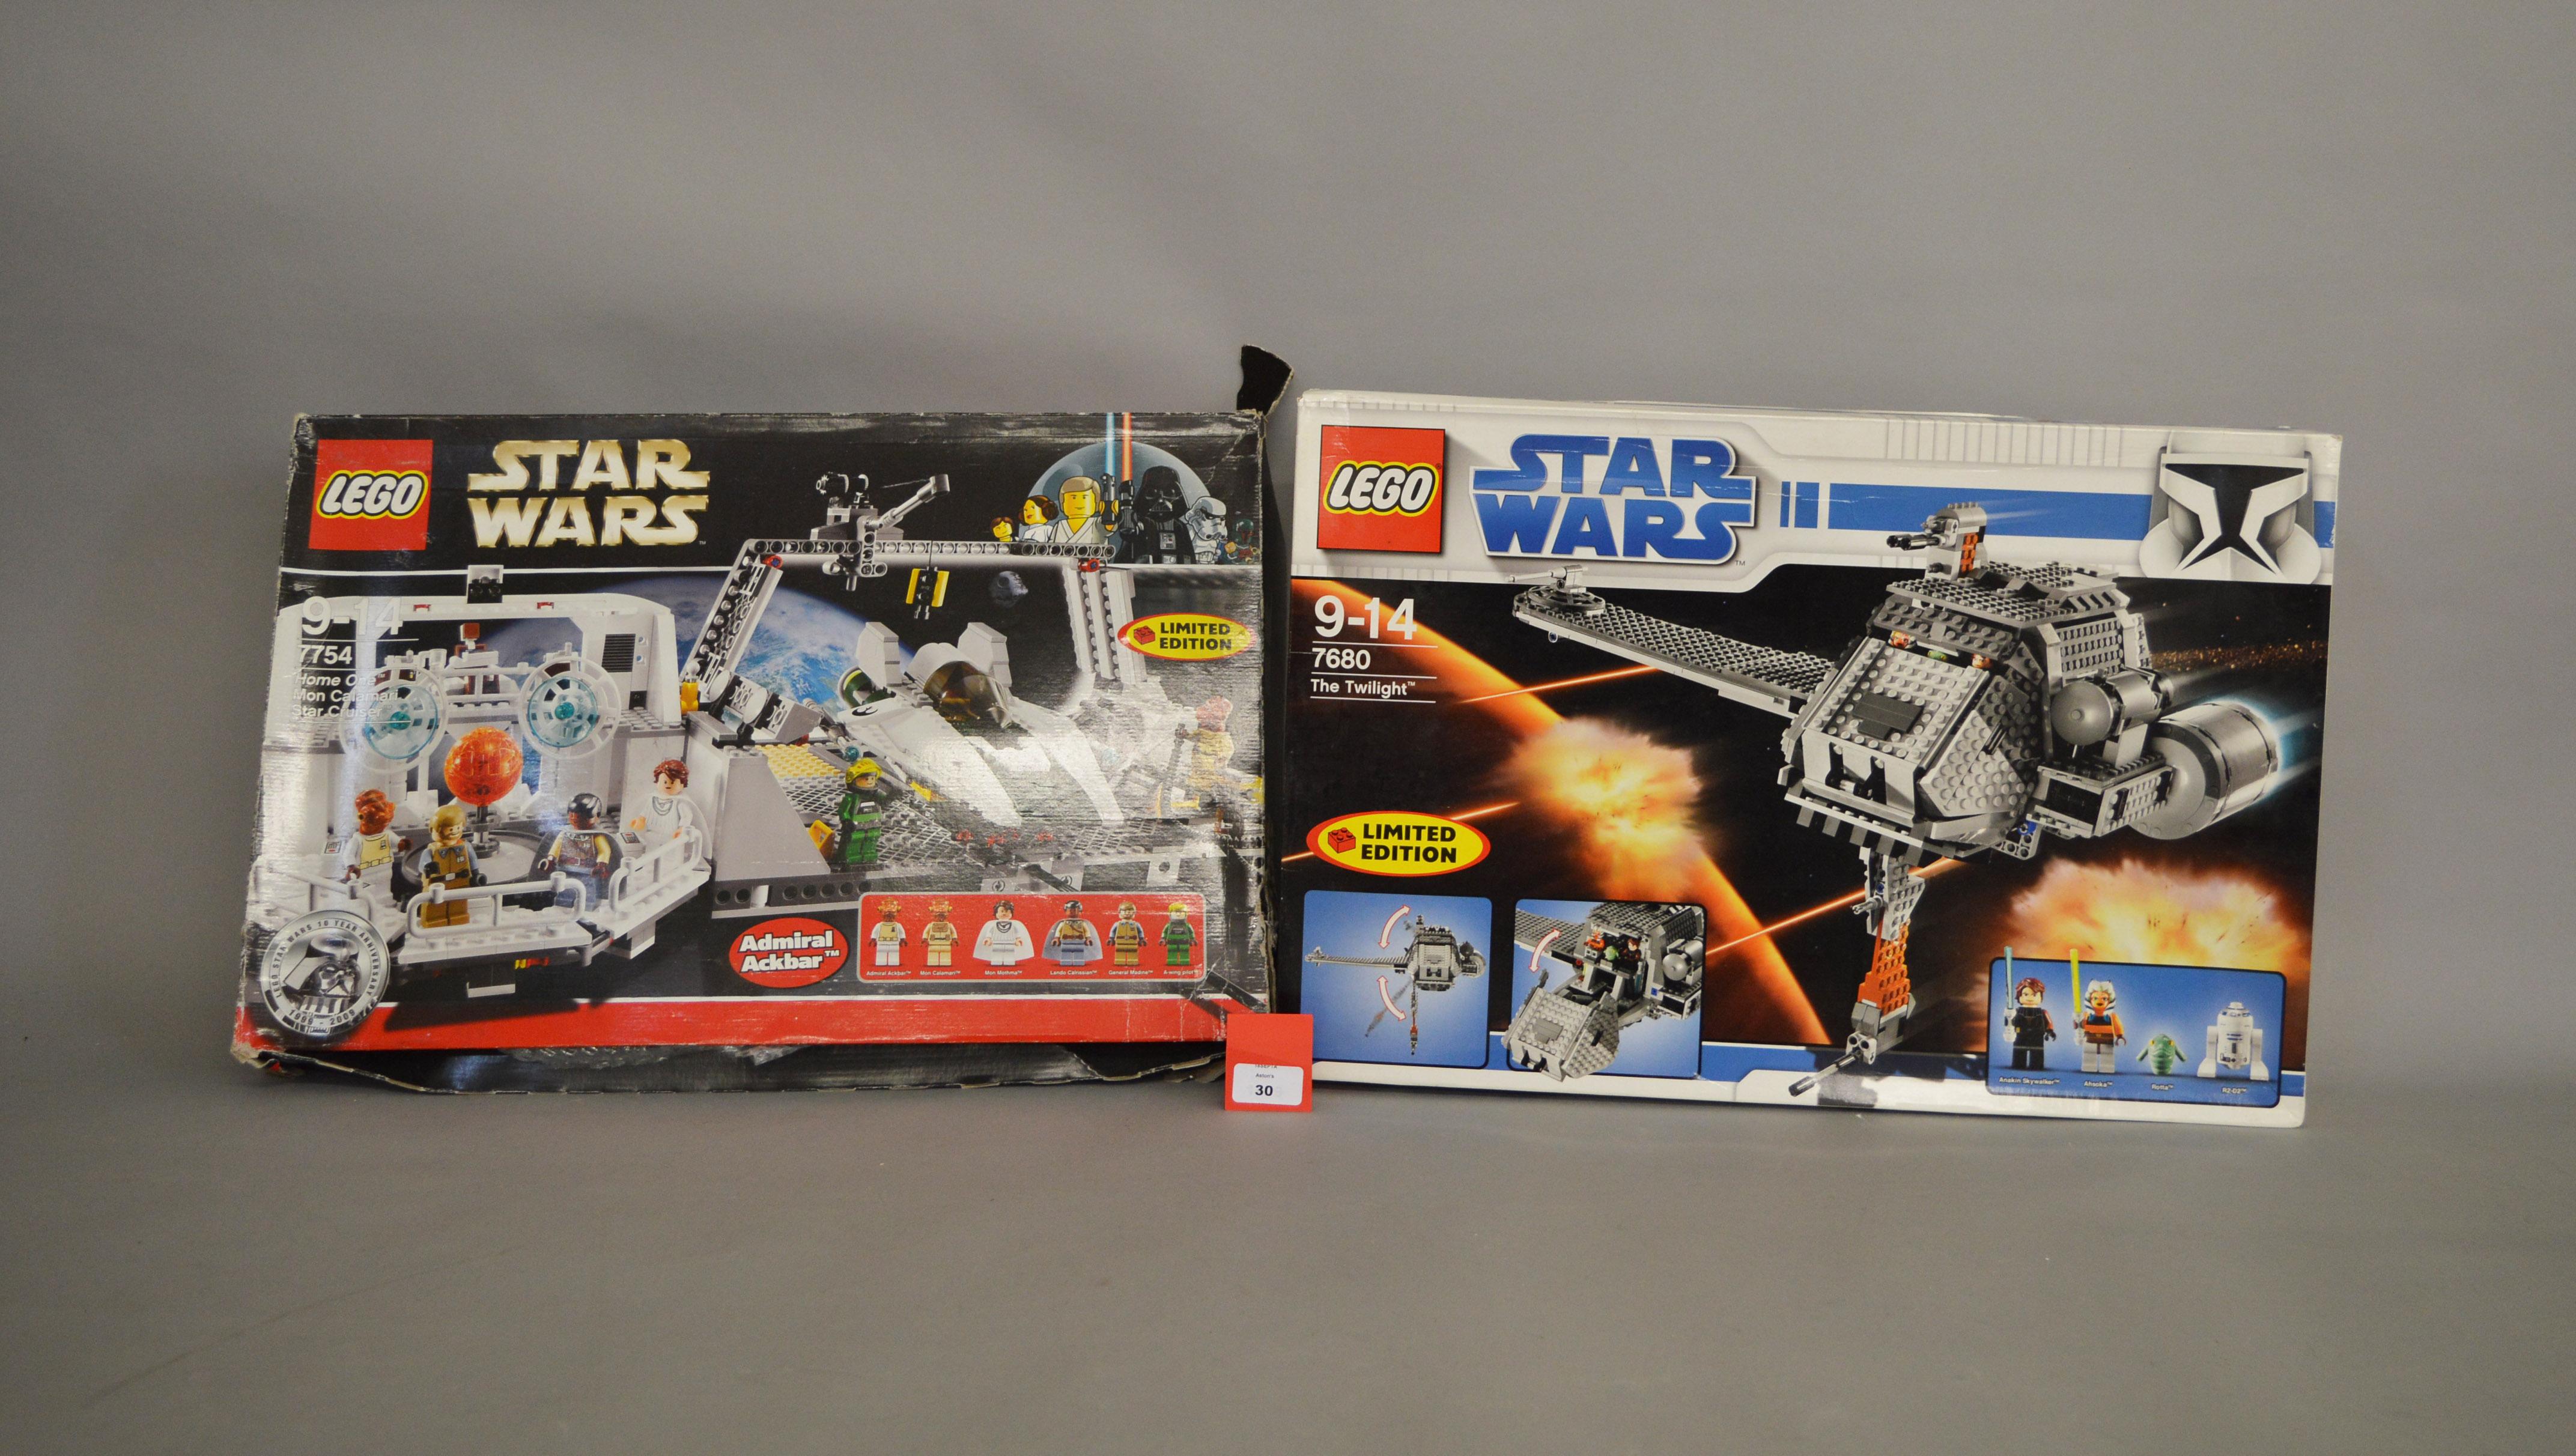 Lot 30 - Two Lego Star Wars sets: 7754 Home One Mon Calamari Star Cruiser; 7680 The Twilight.